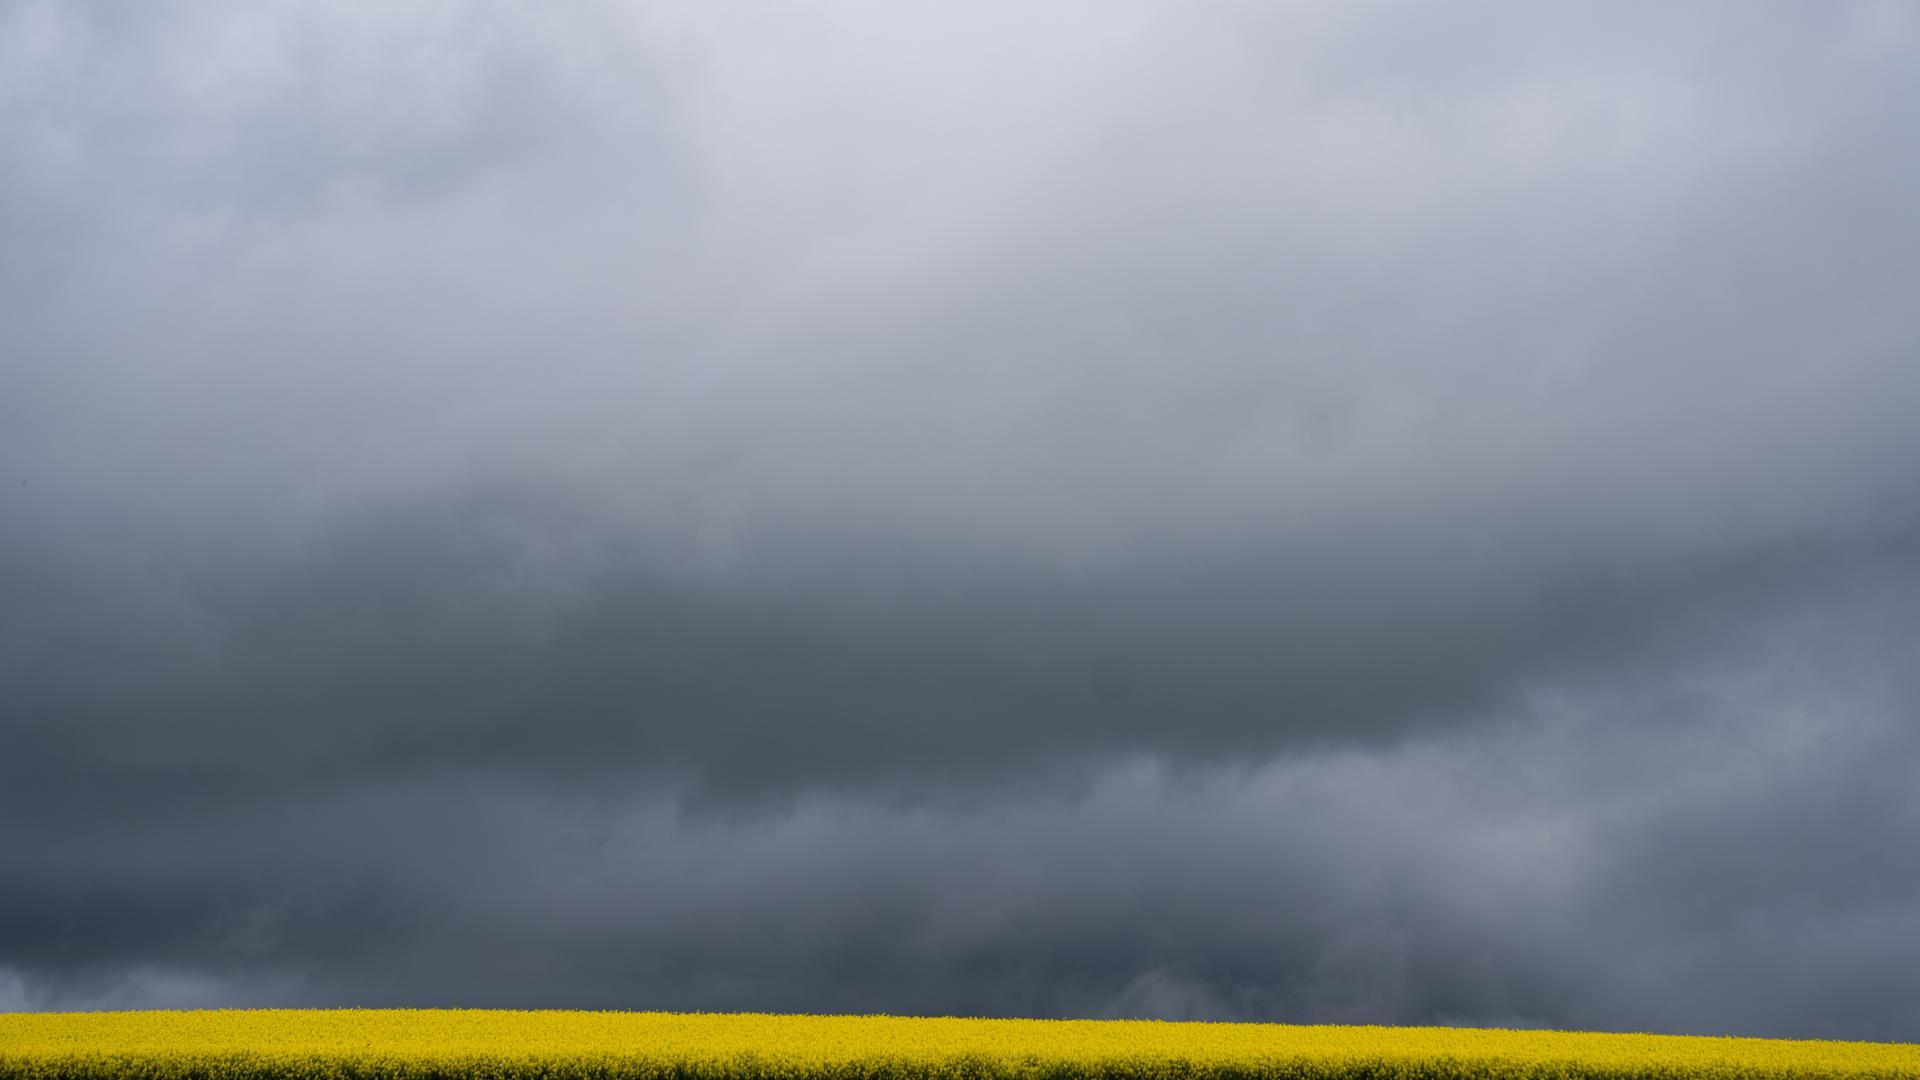 Raps blüht unter den dunklen Regenwolken. +++ dpa-Bildfunk +++